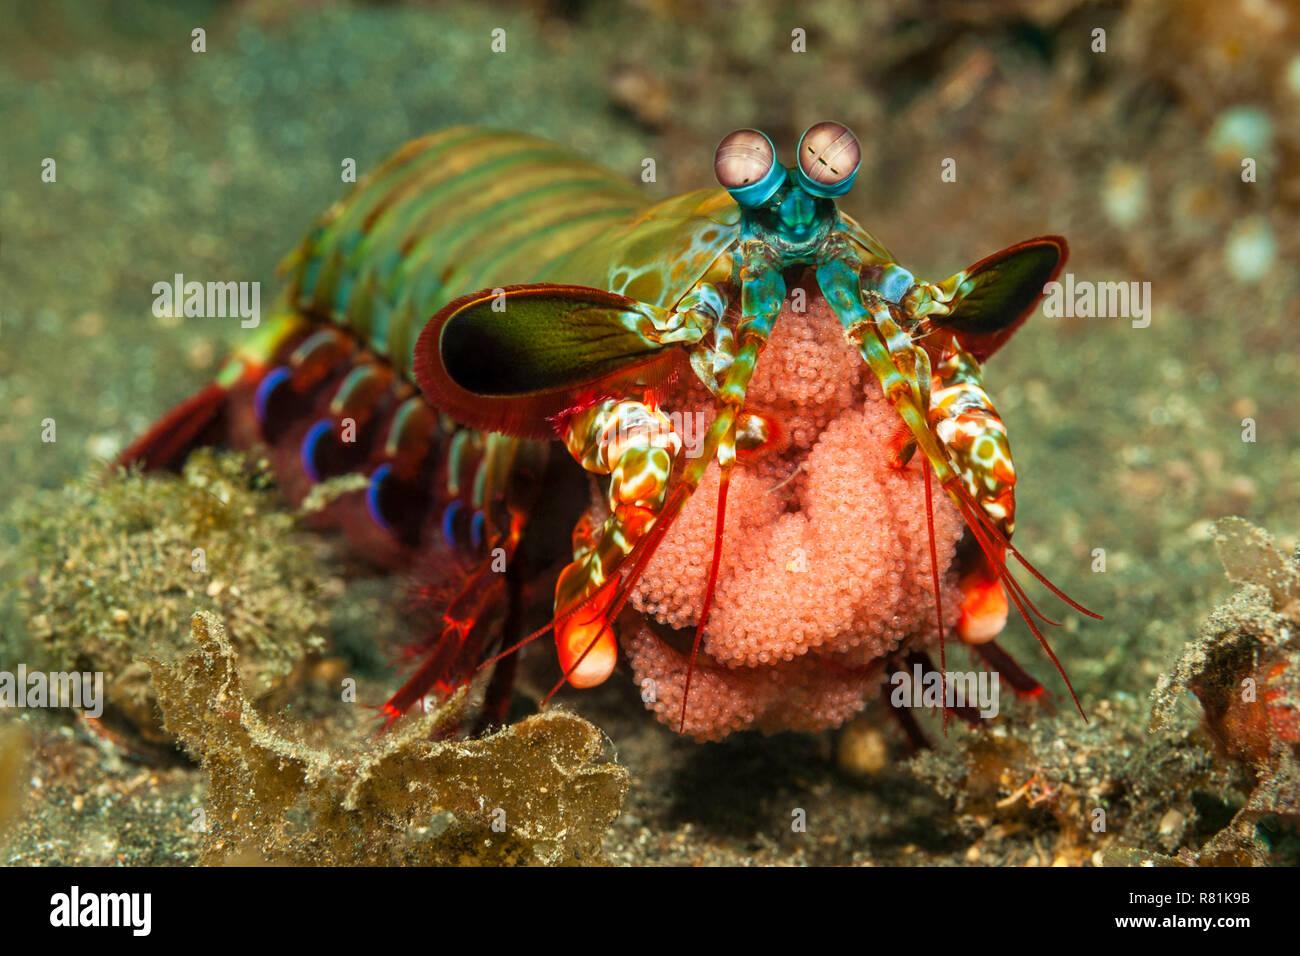 Peacock Mantis Shrimp (Odontodactylus scyllarus). Female with eggs. Molucca Sea, Lembeh Strait, Sulawesi, Indonesia - Stock Image